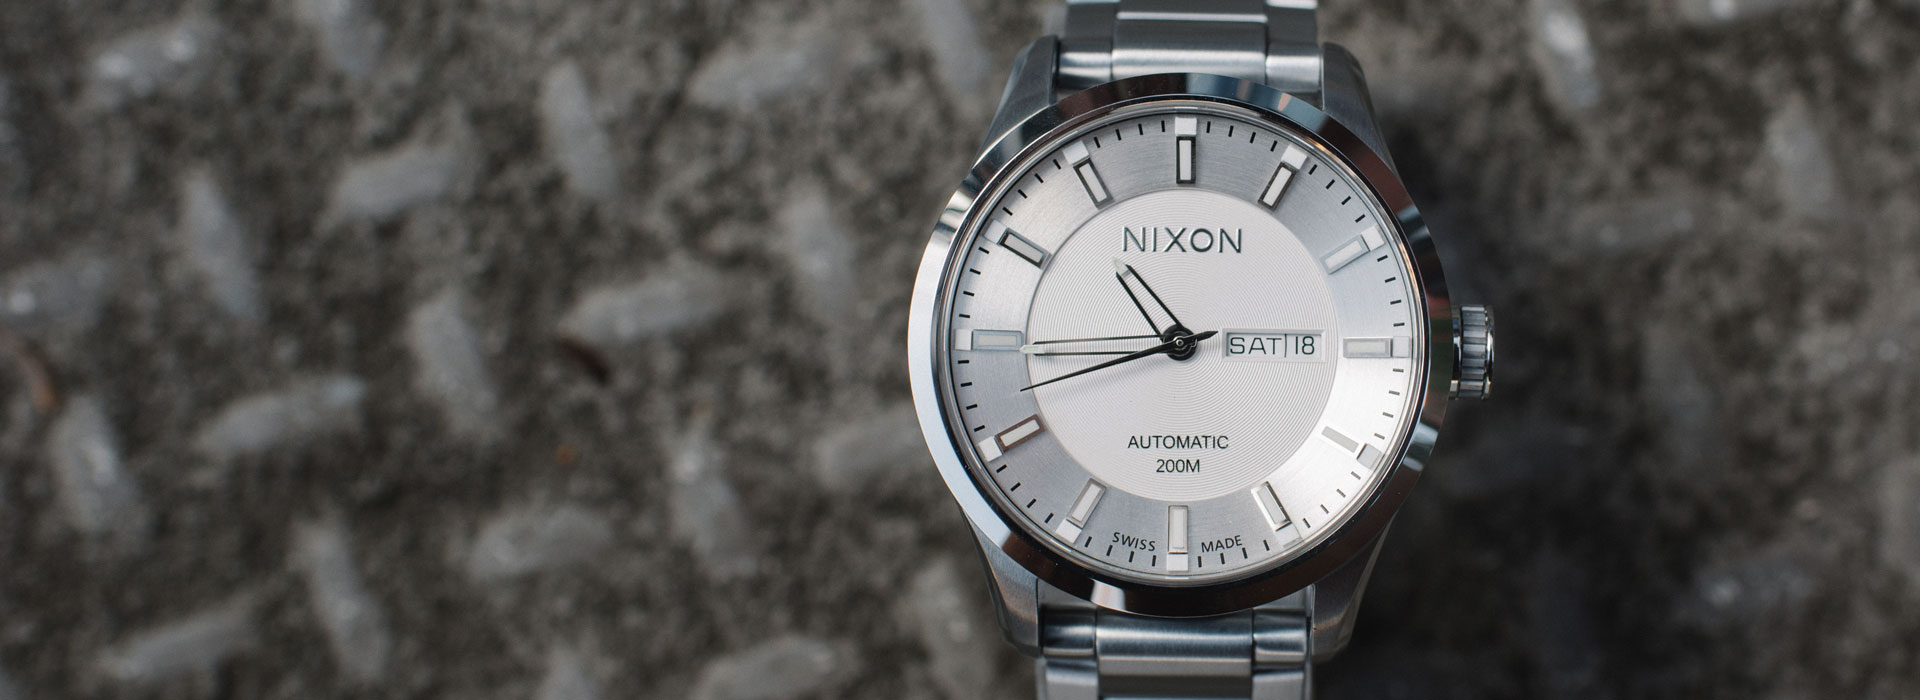 nixon-banner-automaticii.jpg